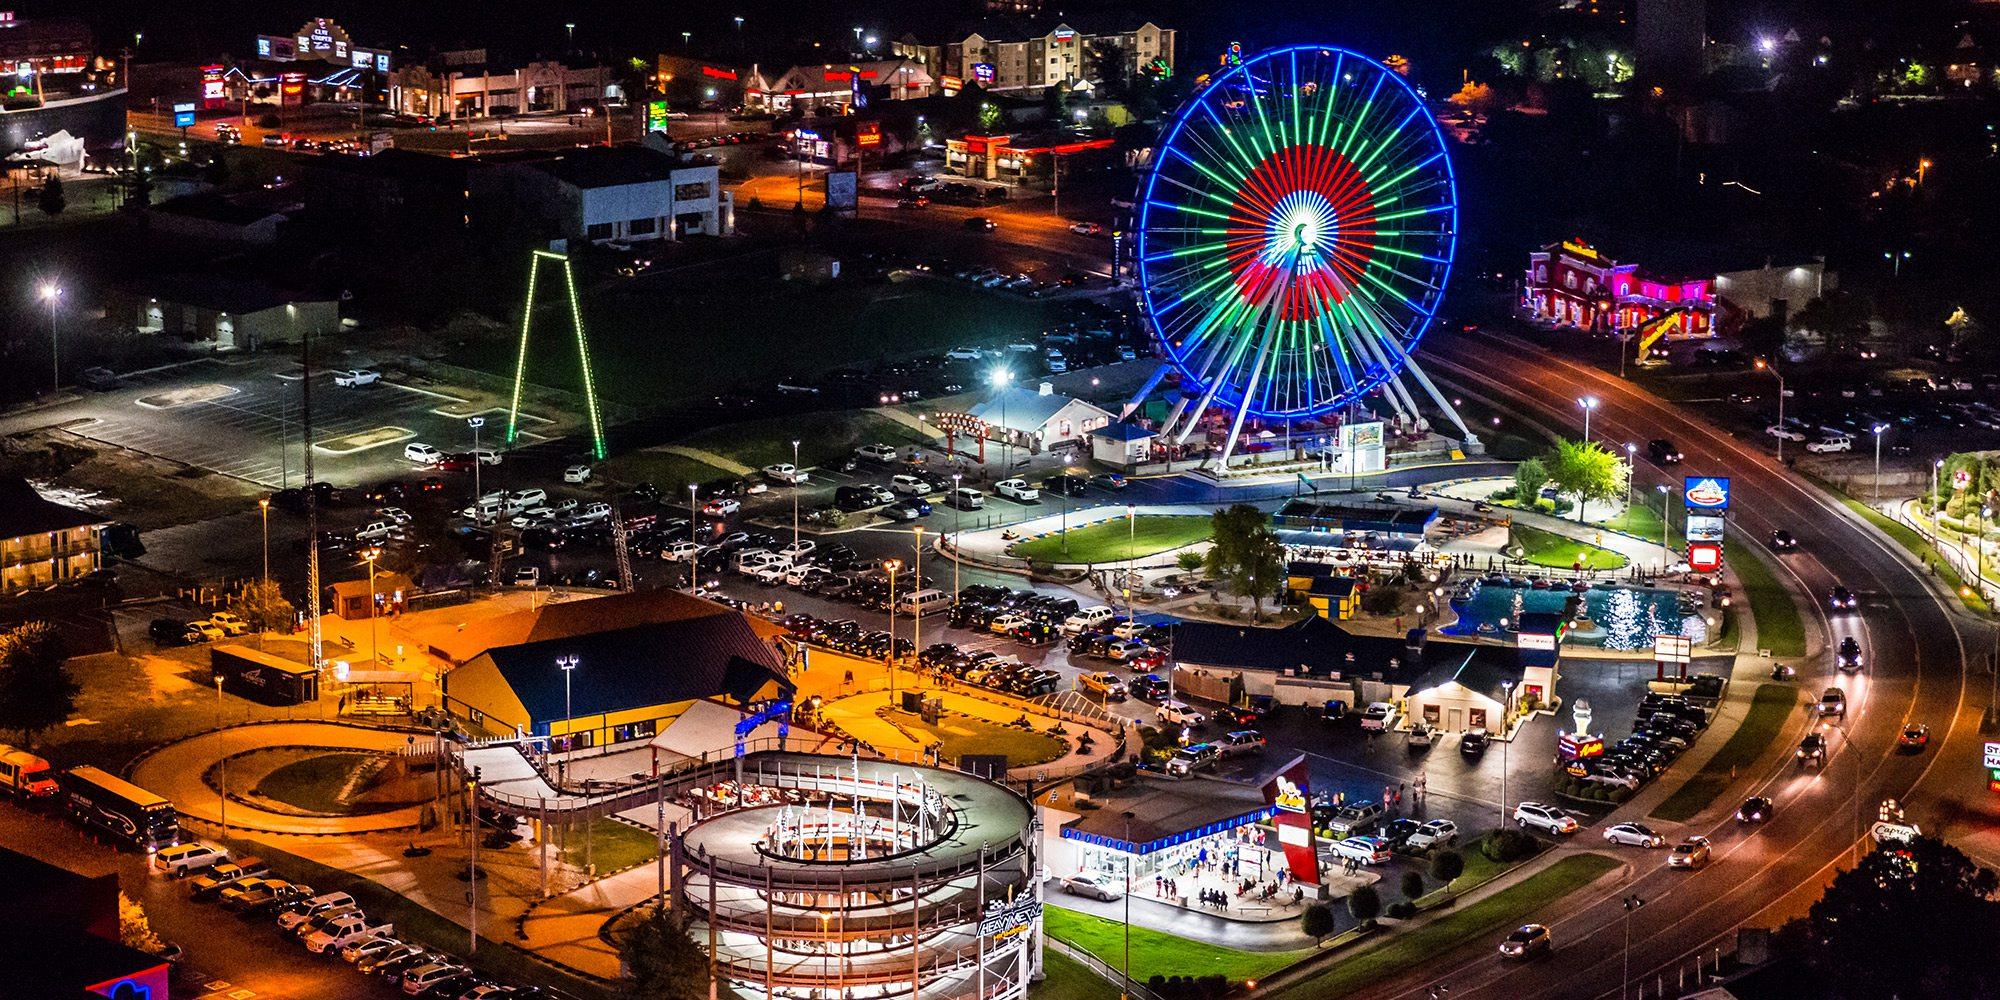 The Branson Ferris Wheel on the Branson, MO skyline